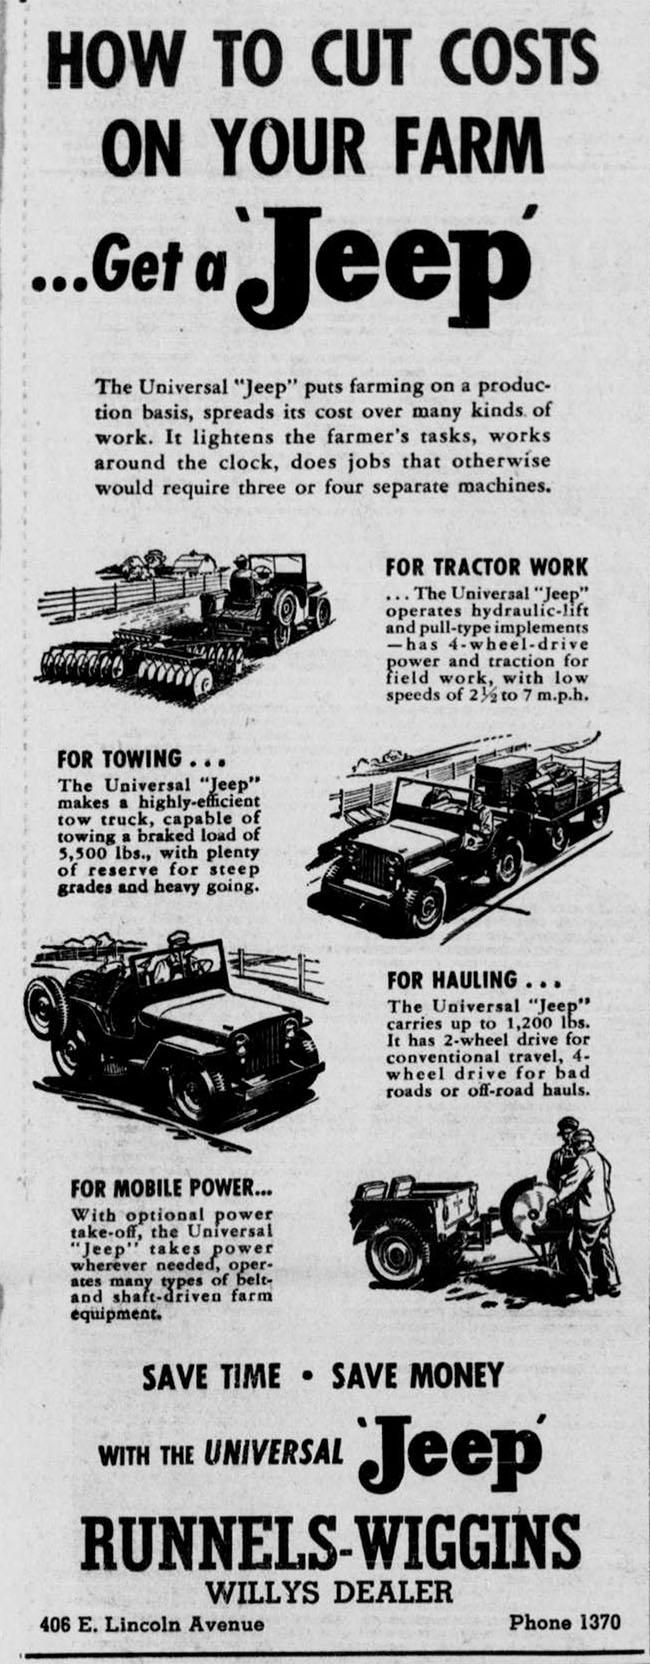 1948-03-19-runnels-wiggins-jeep-ad-lores